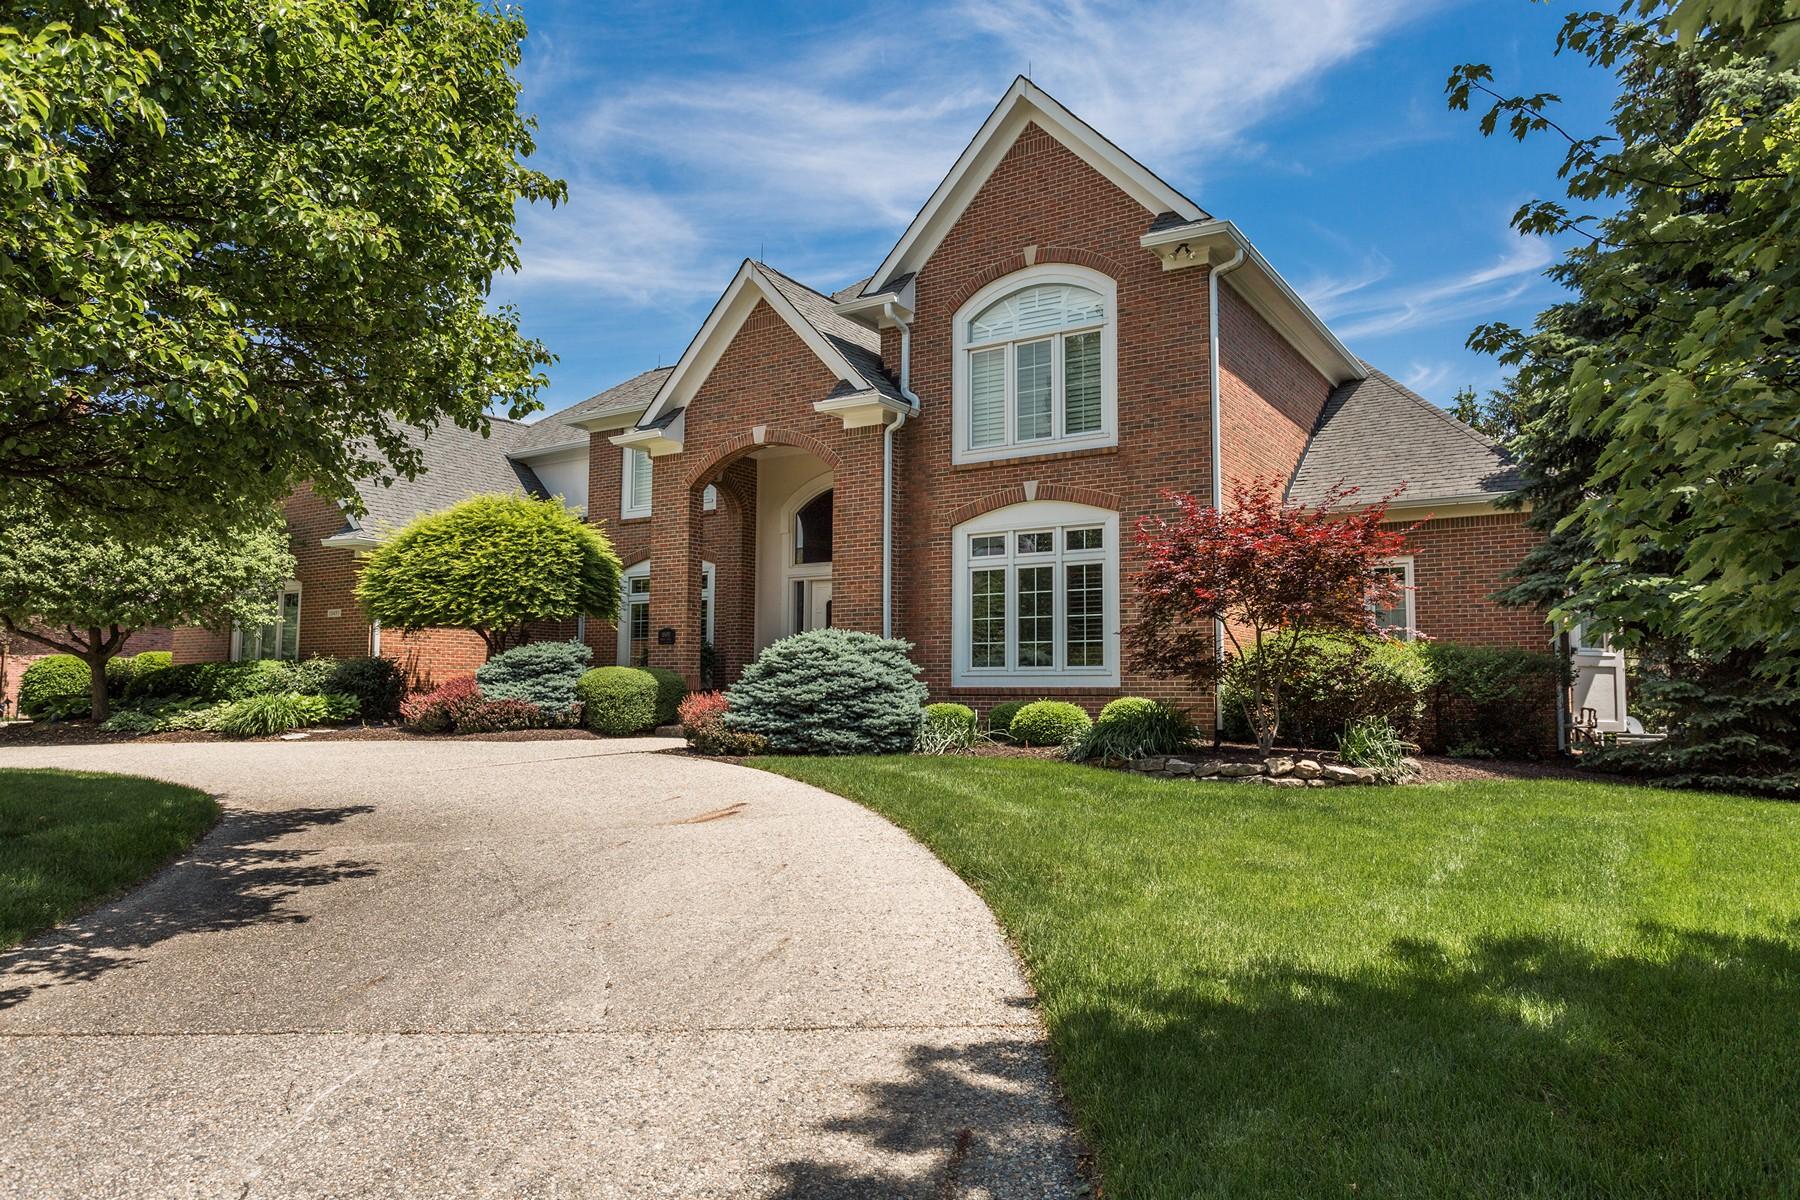 独户住宅 为 销售 在 Extraordinary One Owner Home 10493 Bishop Circle 卡梅尔, 印第安纳州, 46032 美国